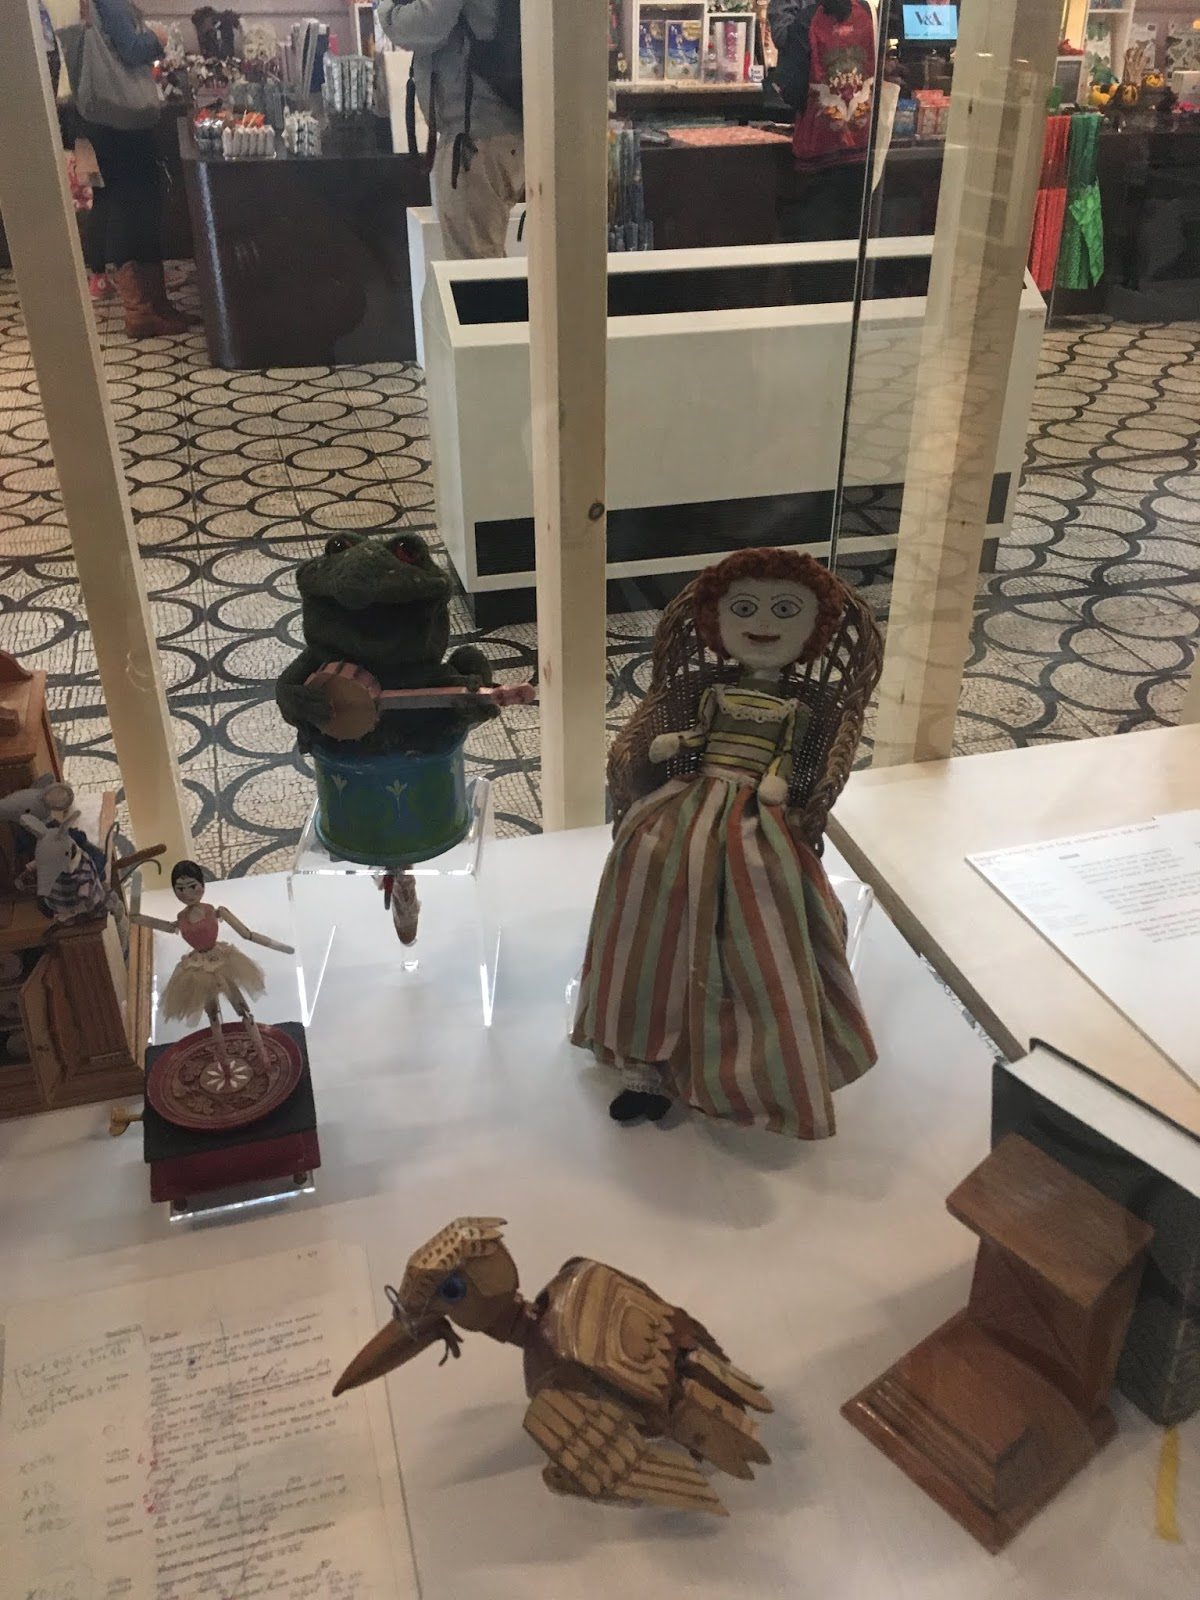 Gabriel the Frog, Madeline the Rag Doll, Professor Yaffle